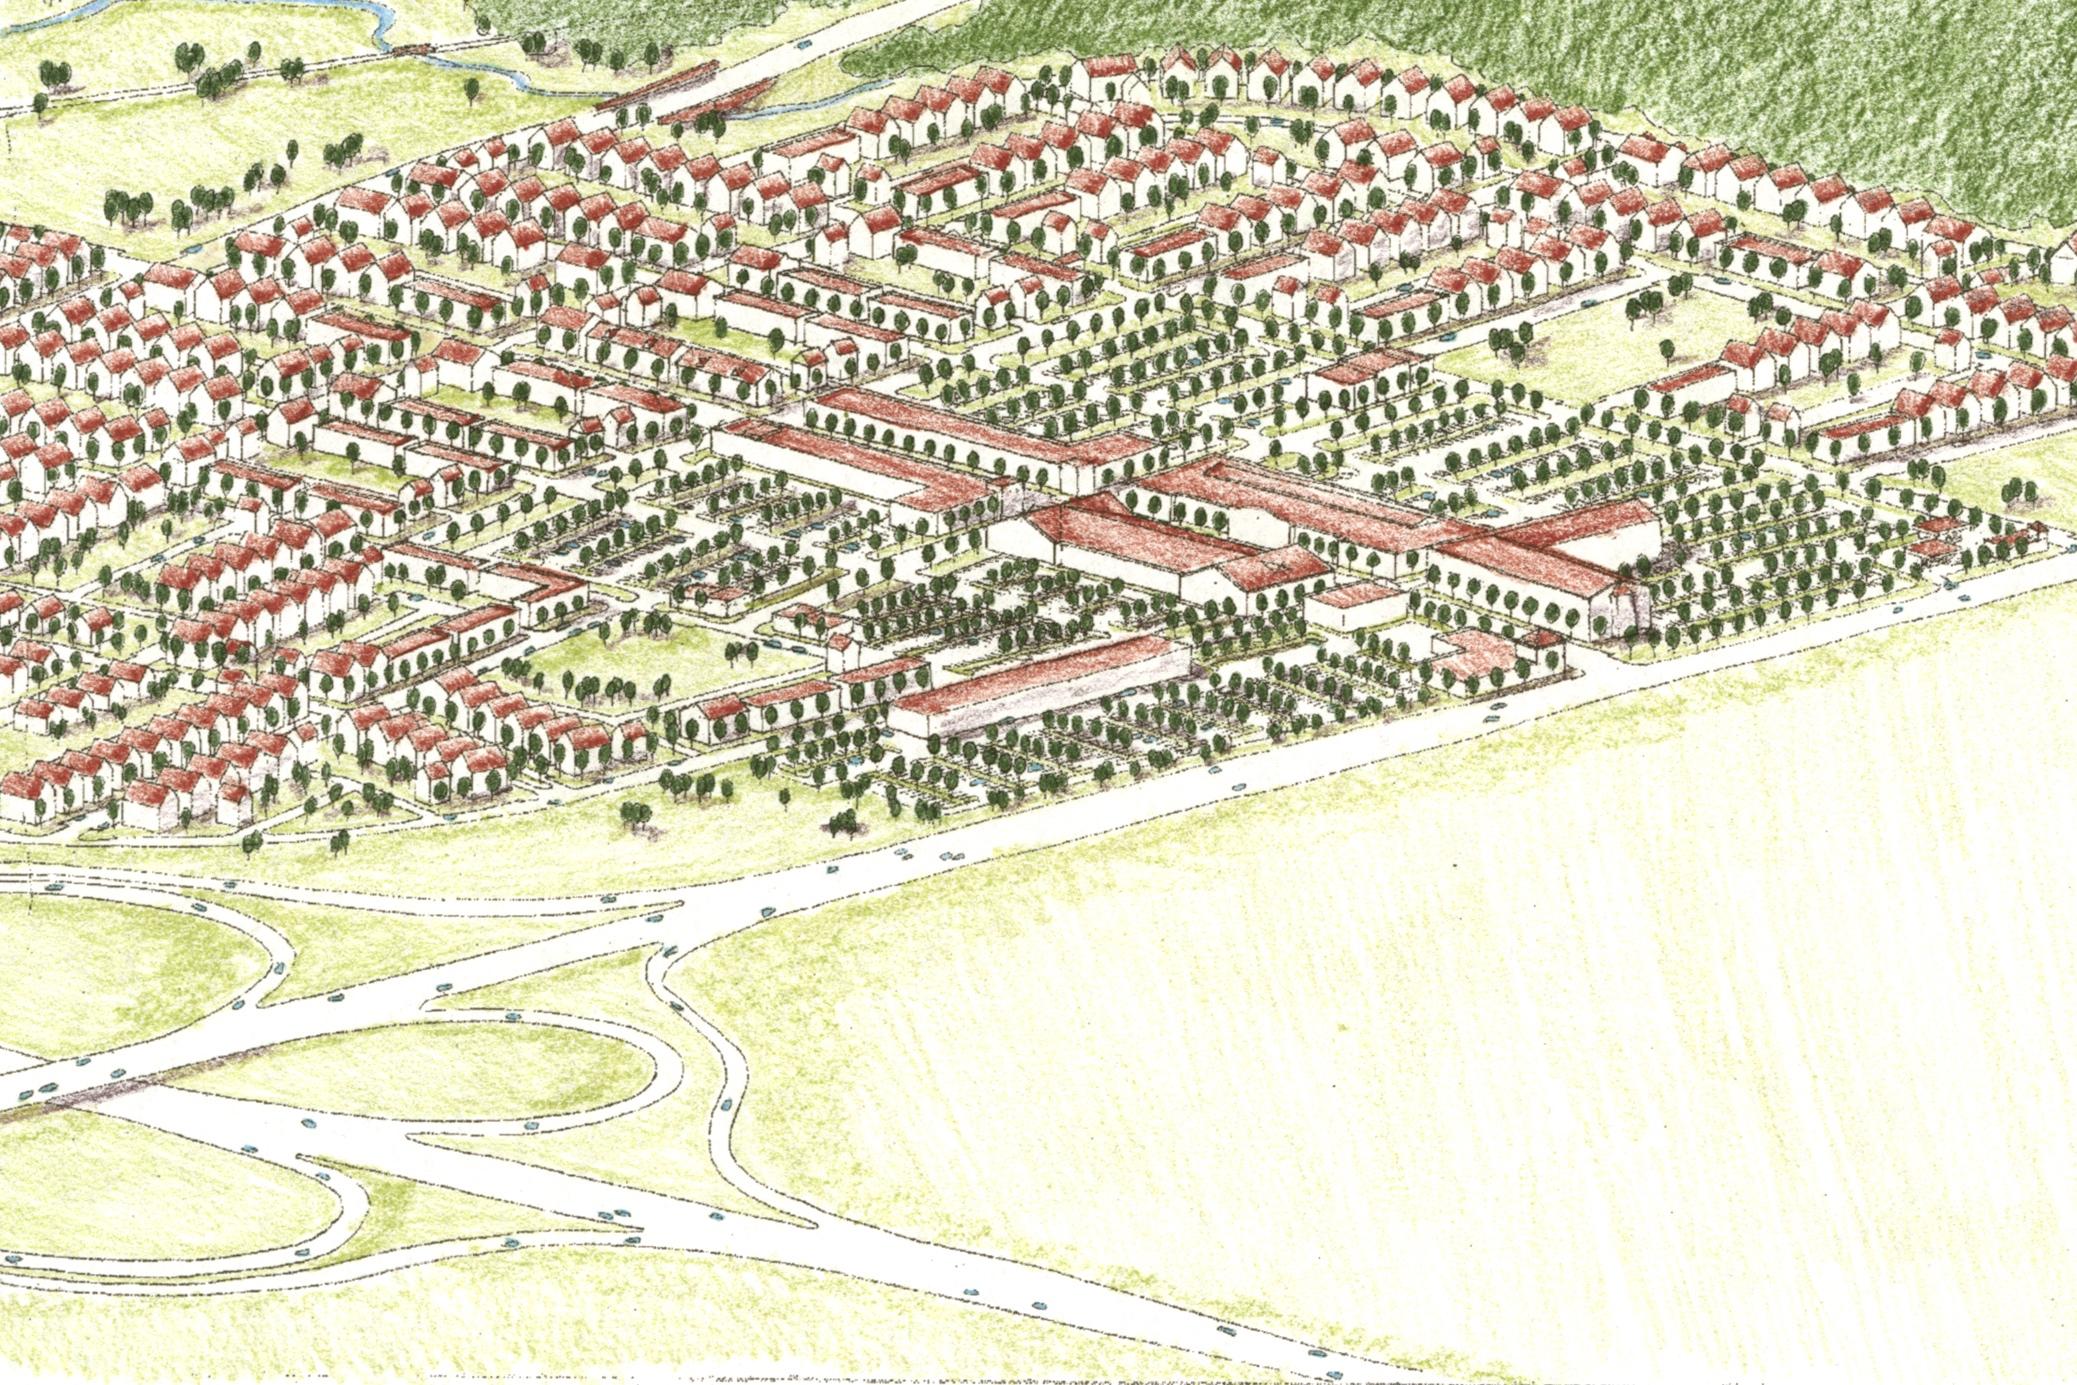 McLean County Development Impact Study -